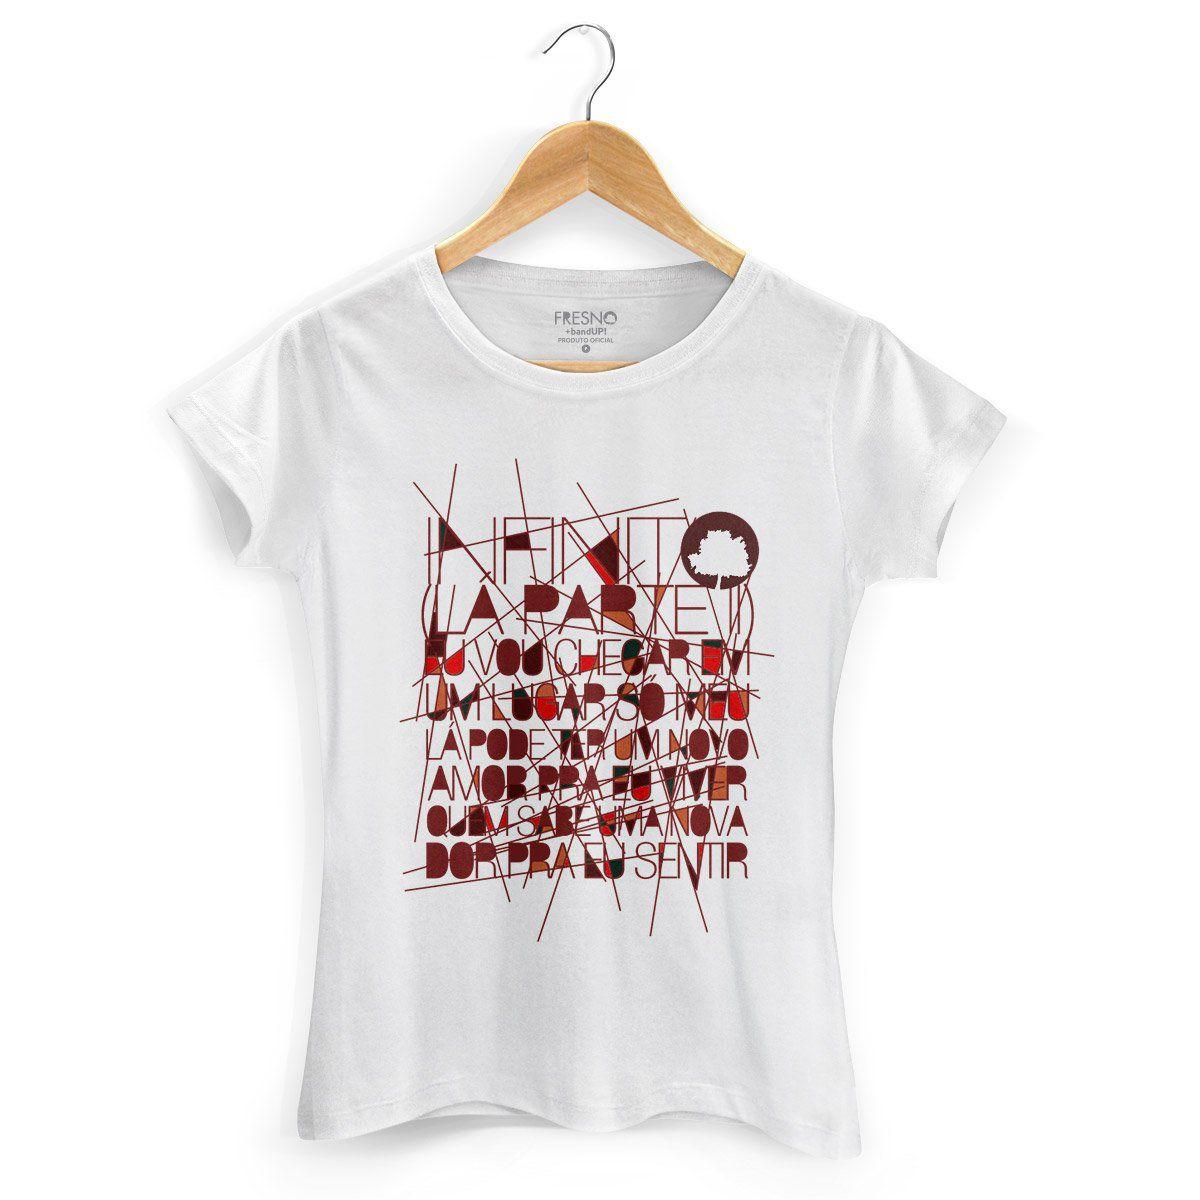 Camiseta Feminina Fresno - Infinito Parte II